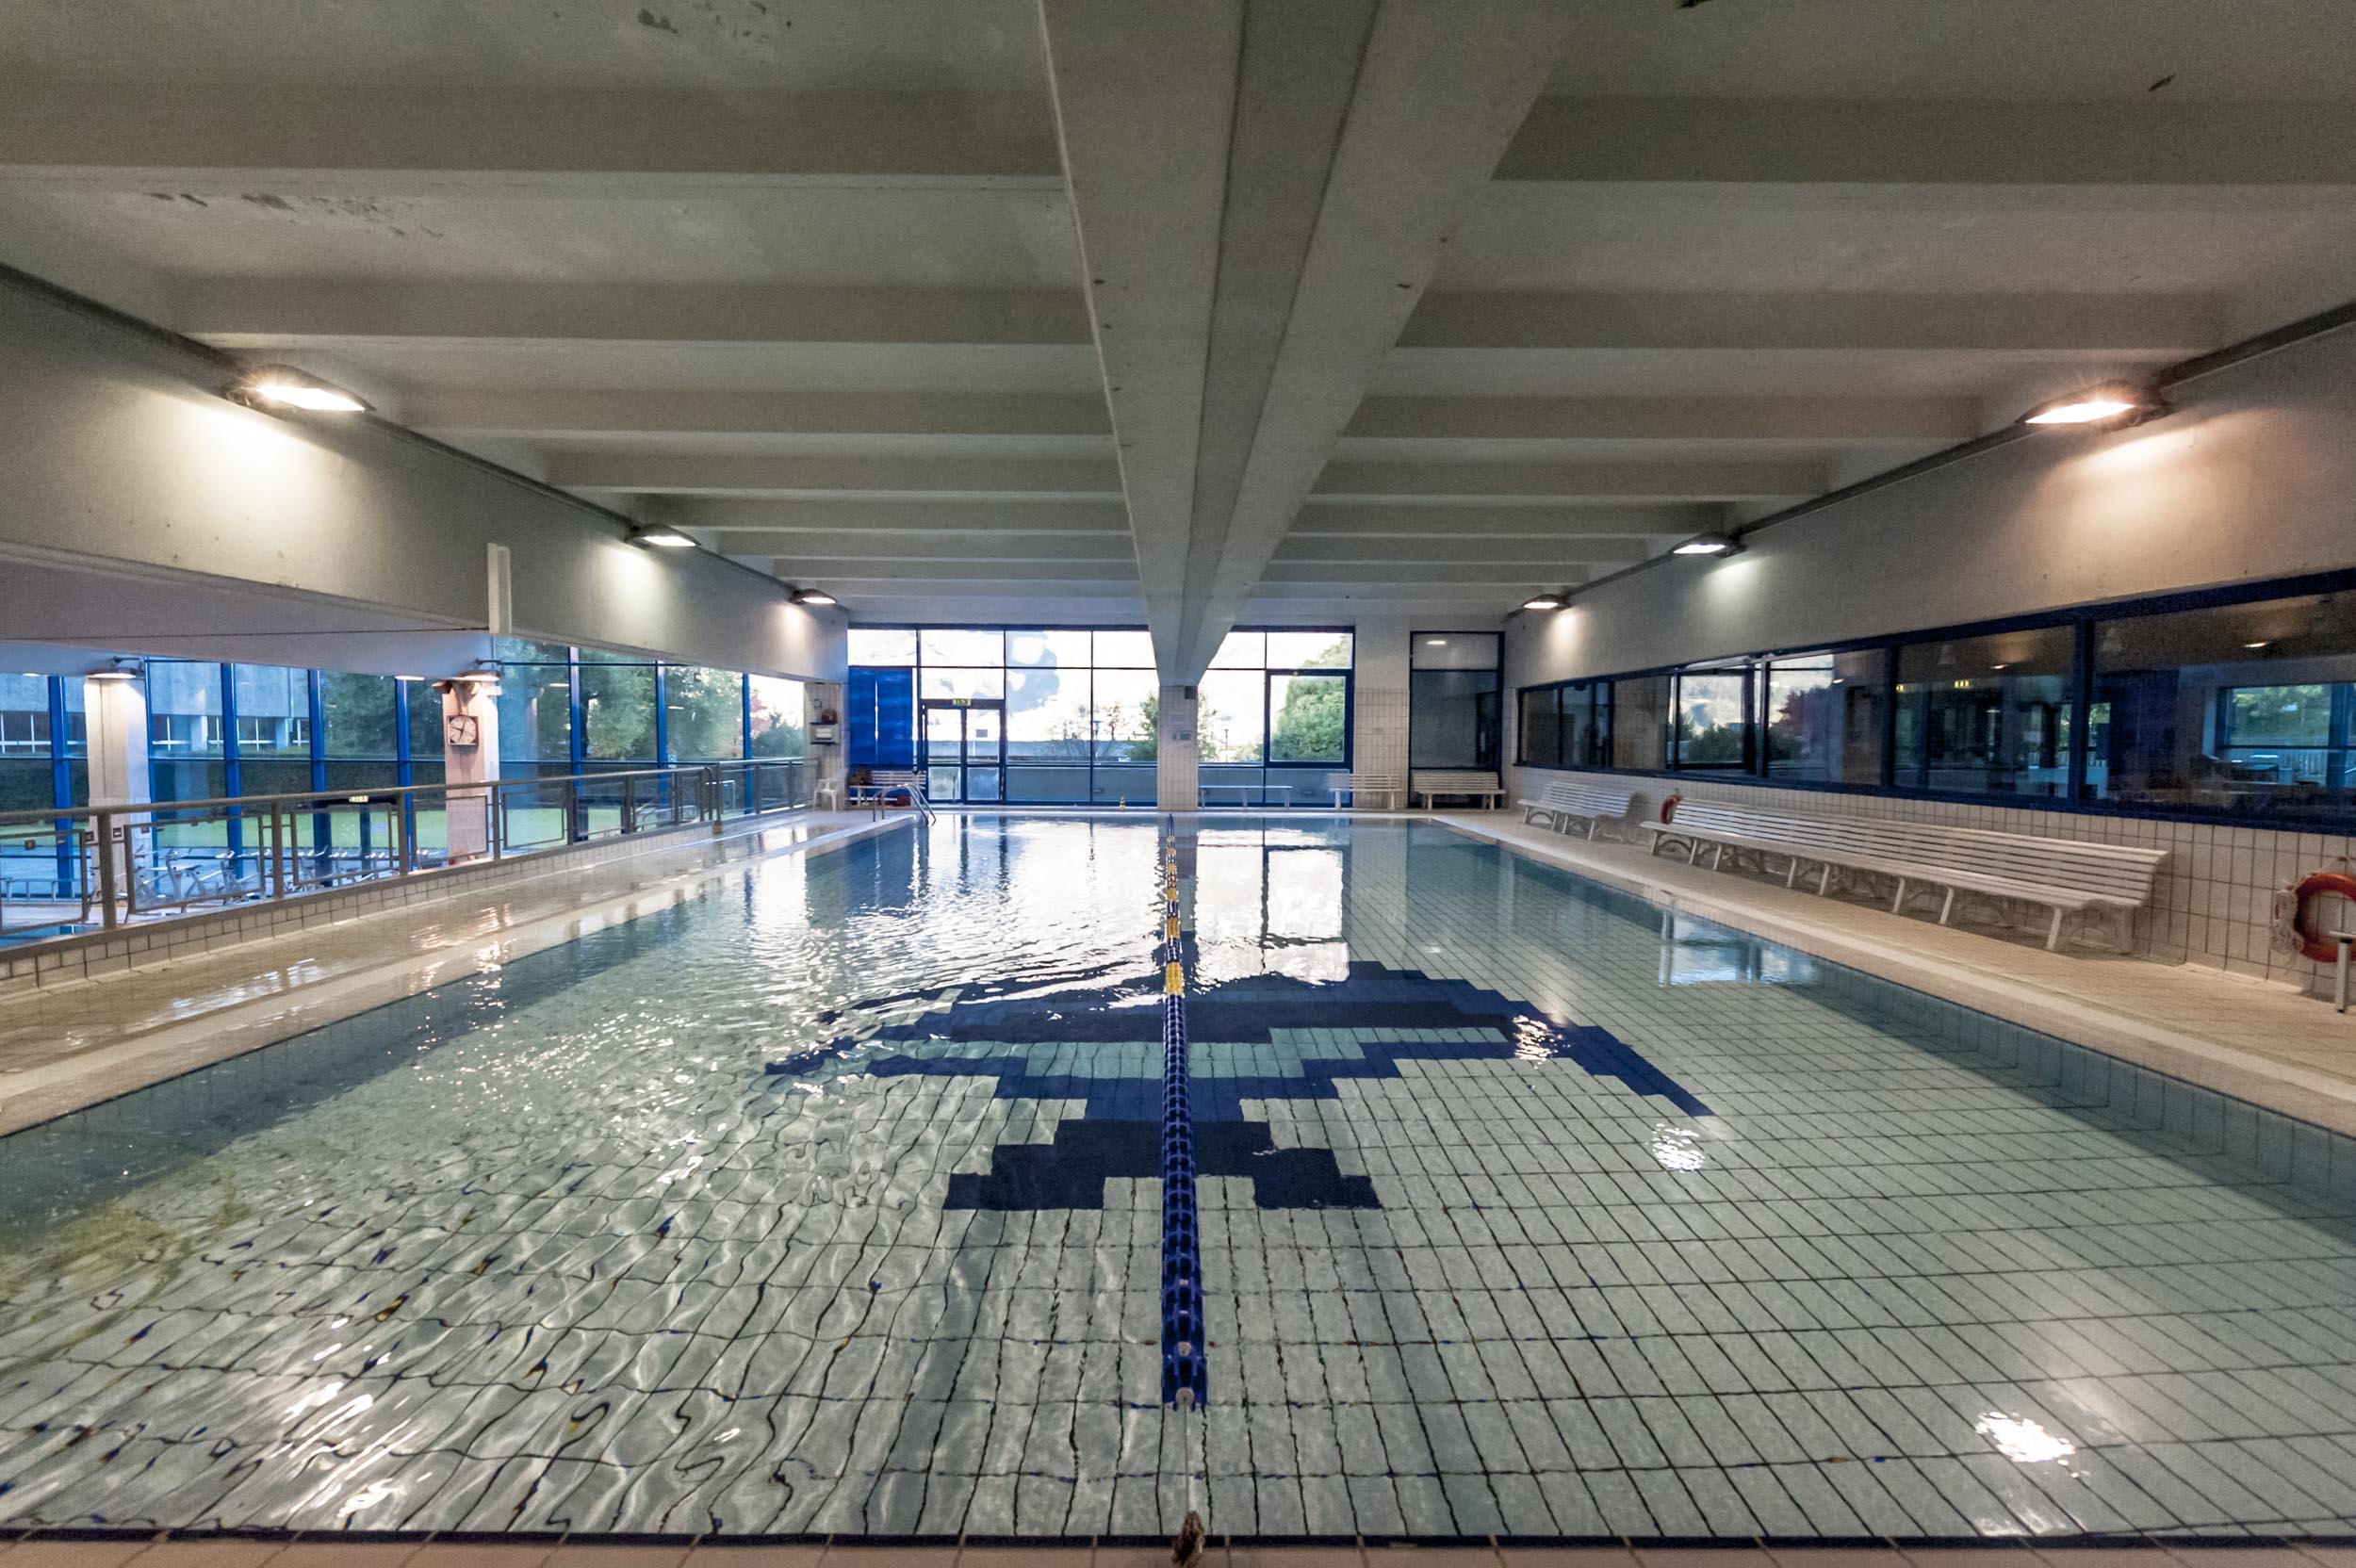 palestra e piscina madonna bianca trento centro i del